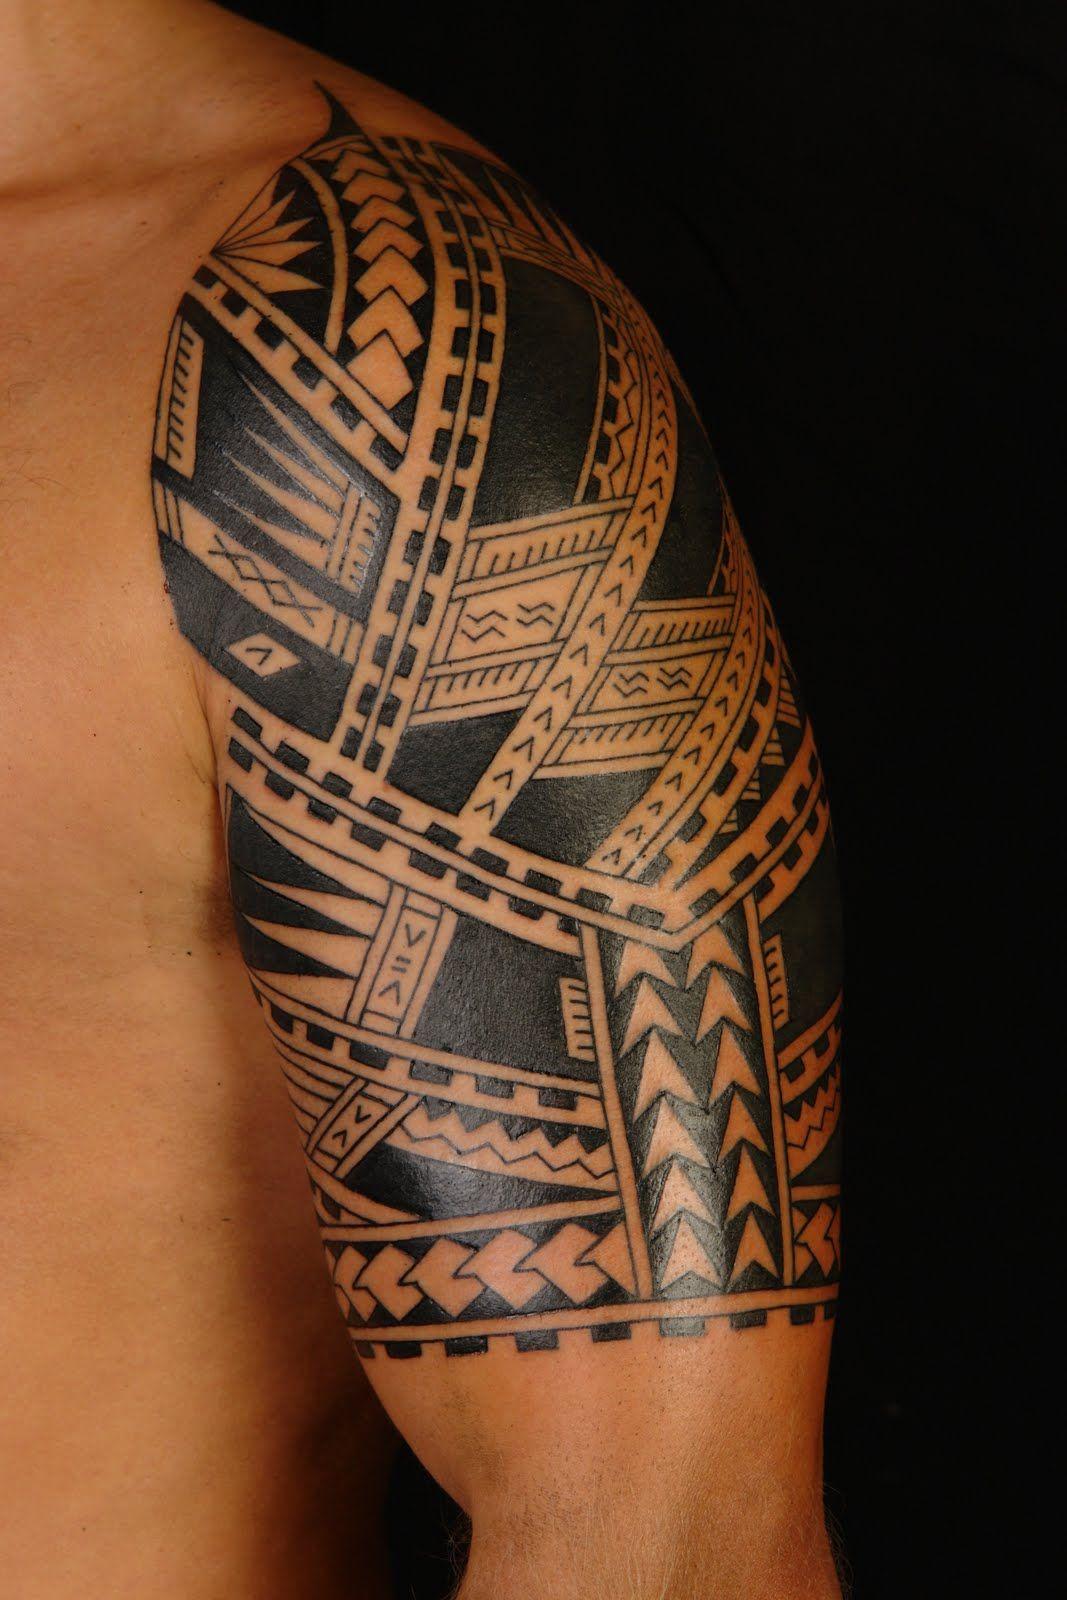 TATUAJES MAORIES SIGNIFICADO Y 9 TEMAS Tatuajes Pinterest